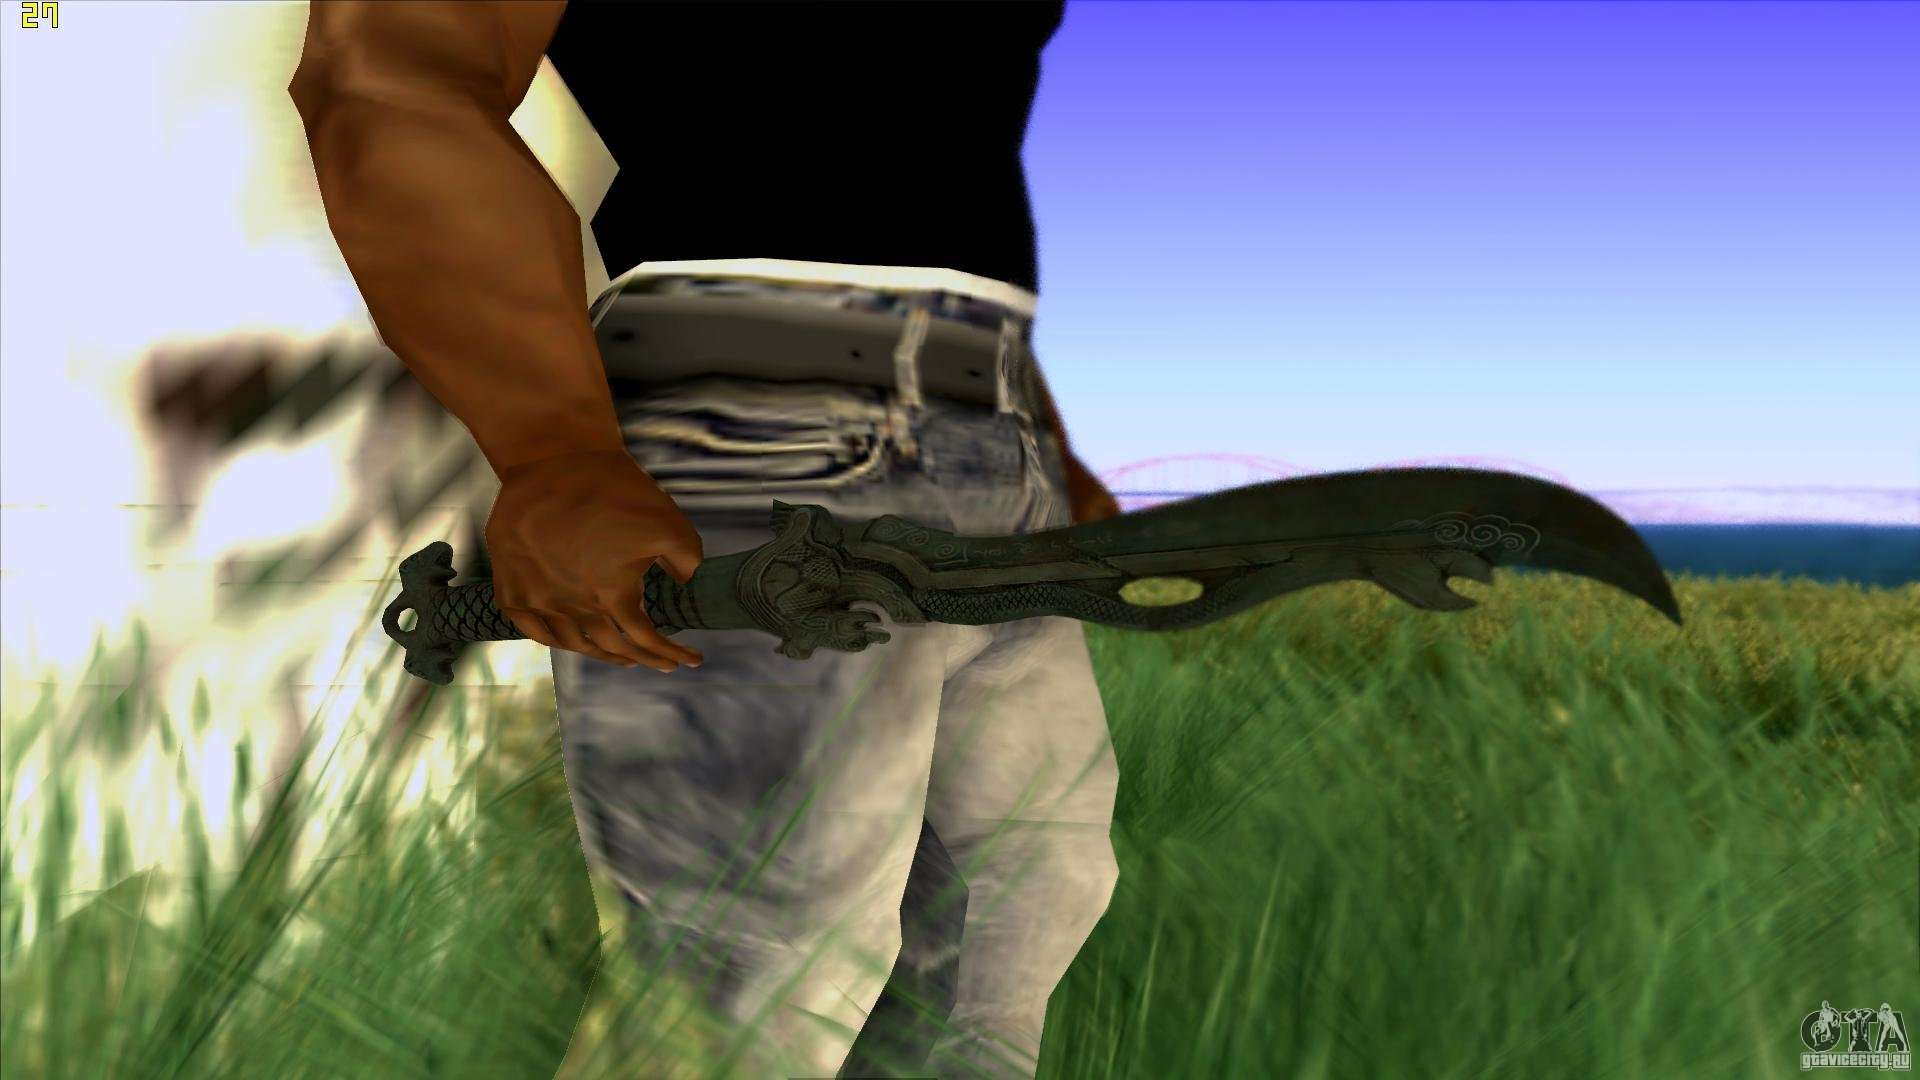 Gta San Andreas Knife Cry 3 For Gta San Andreas